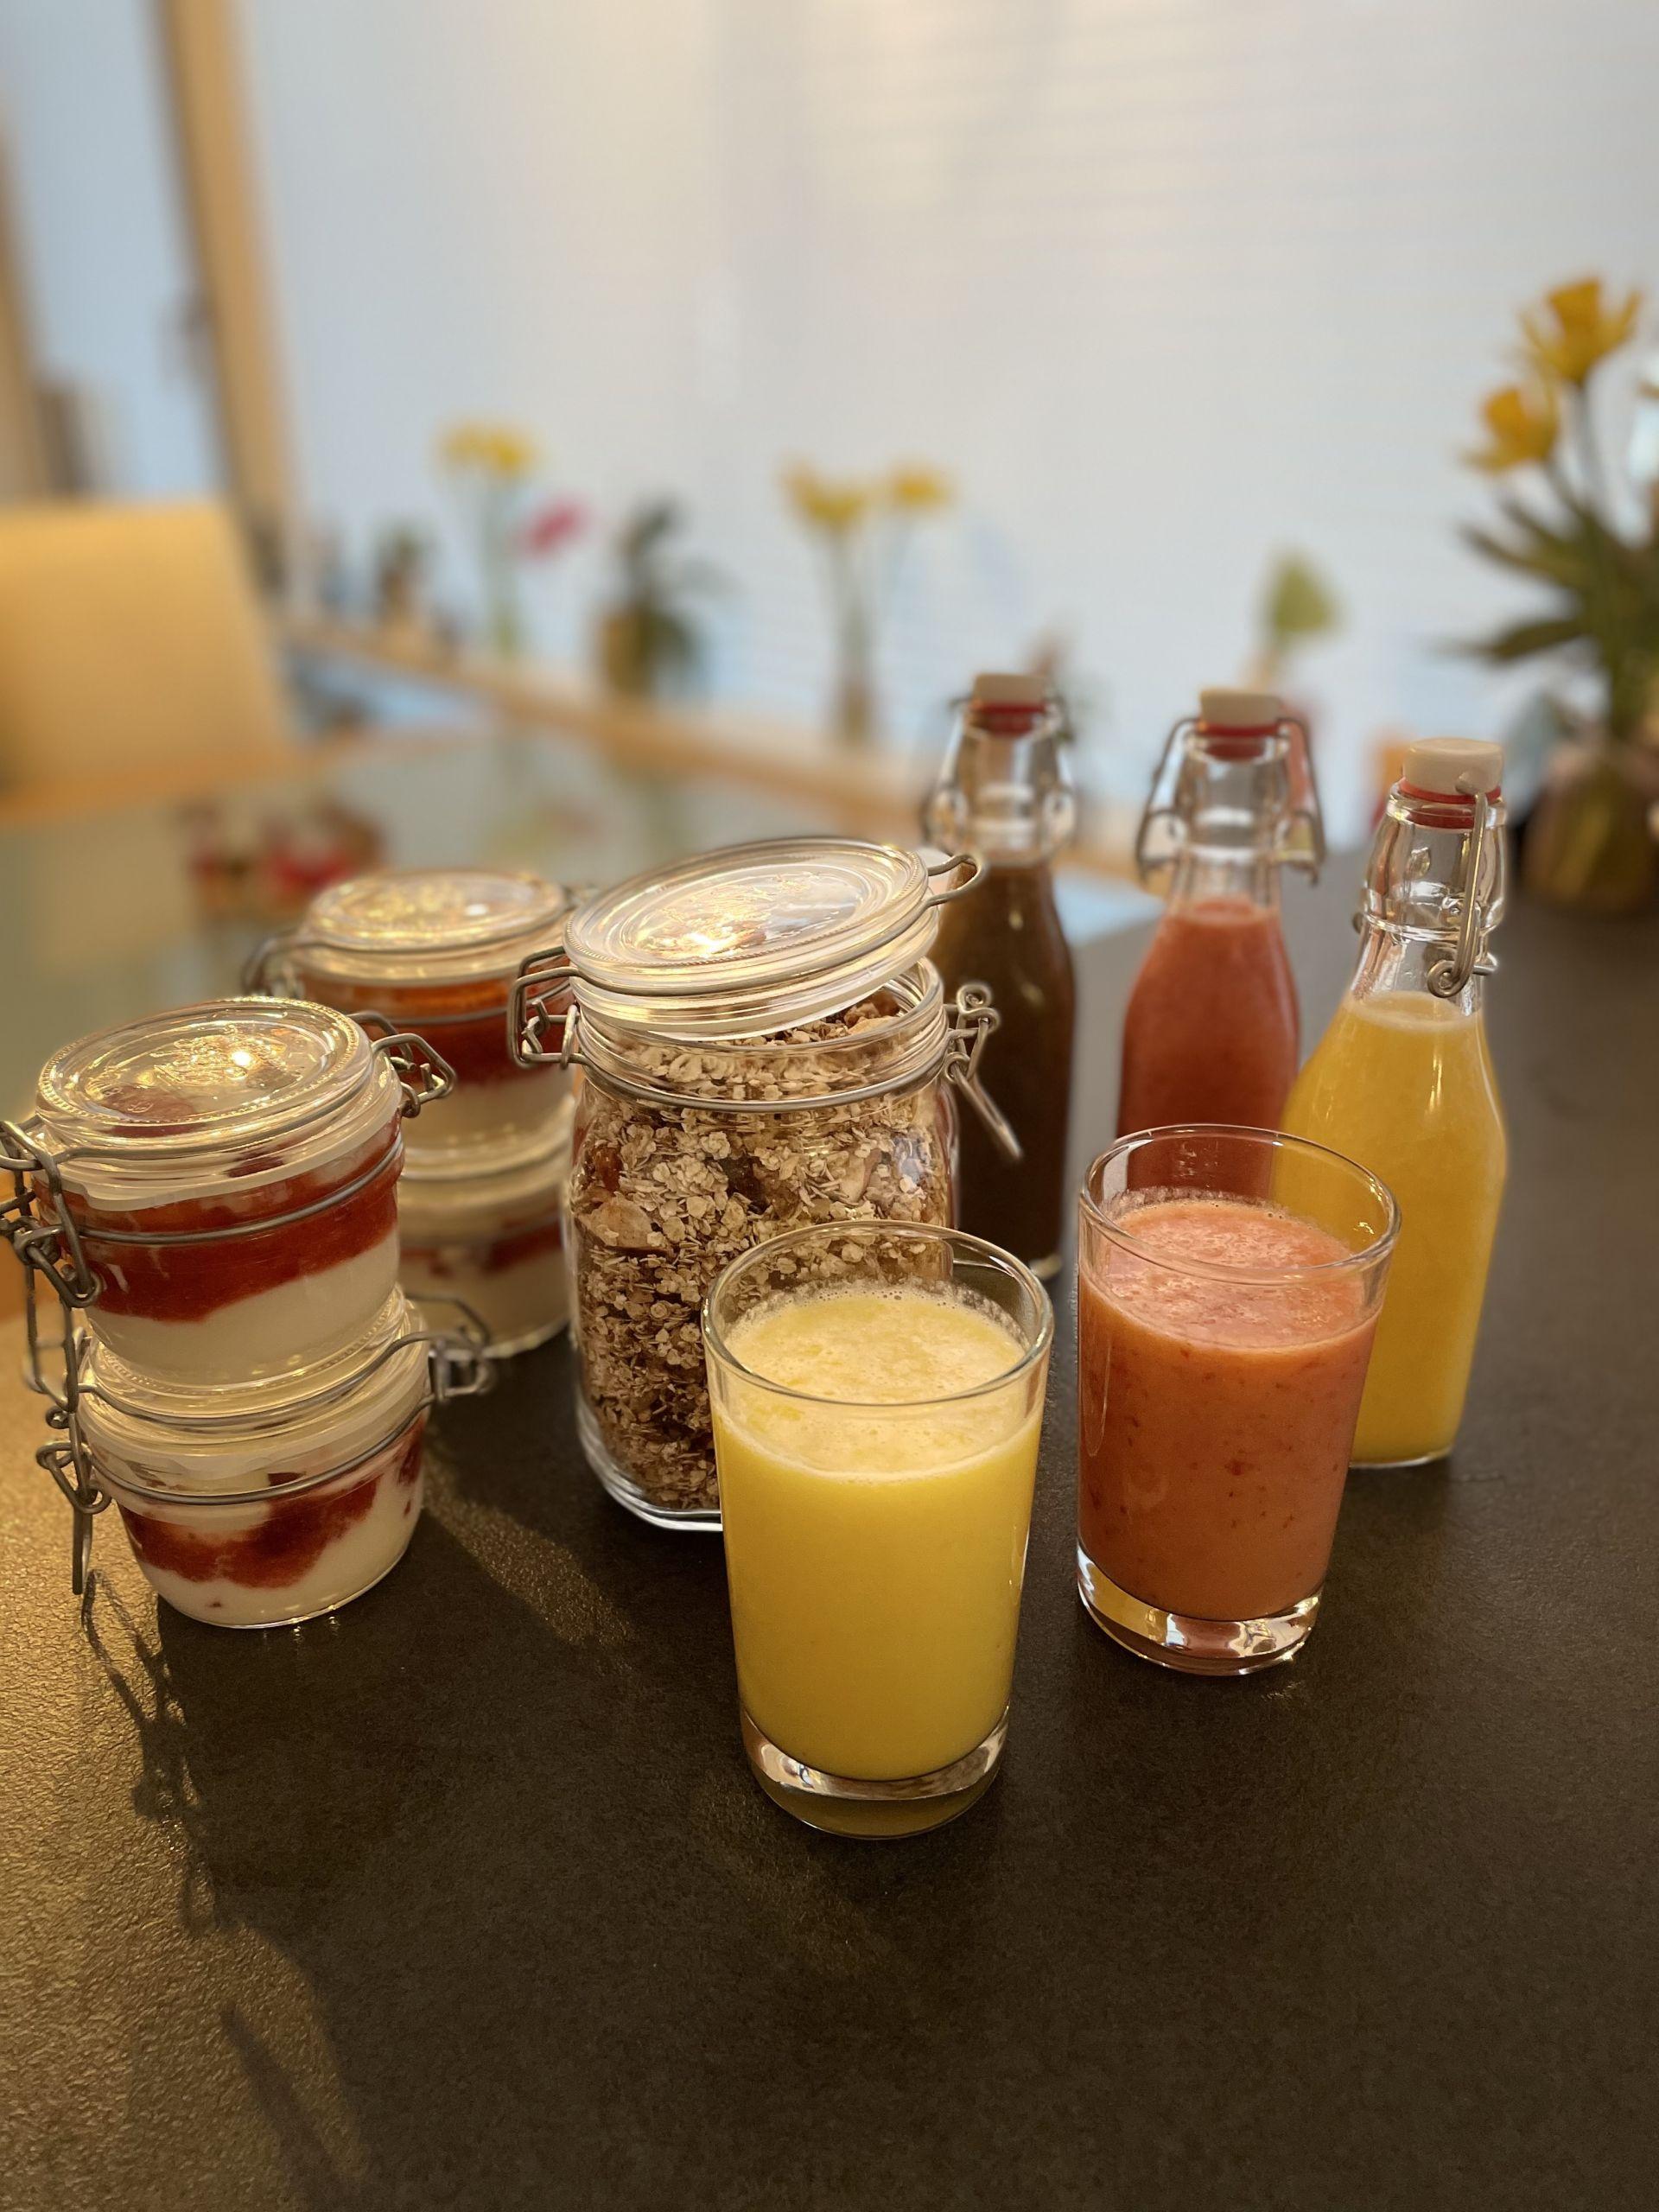 Gesundes Frühstück von Kinder-Kochkurs.com